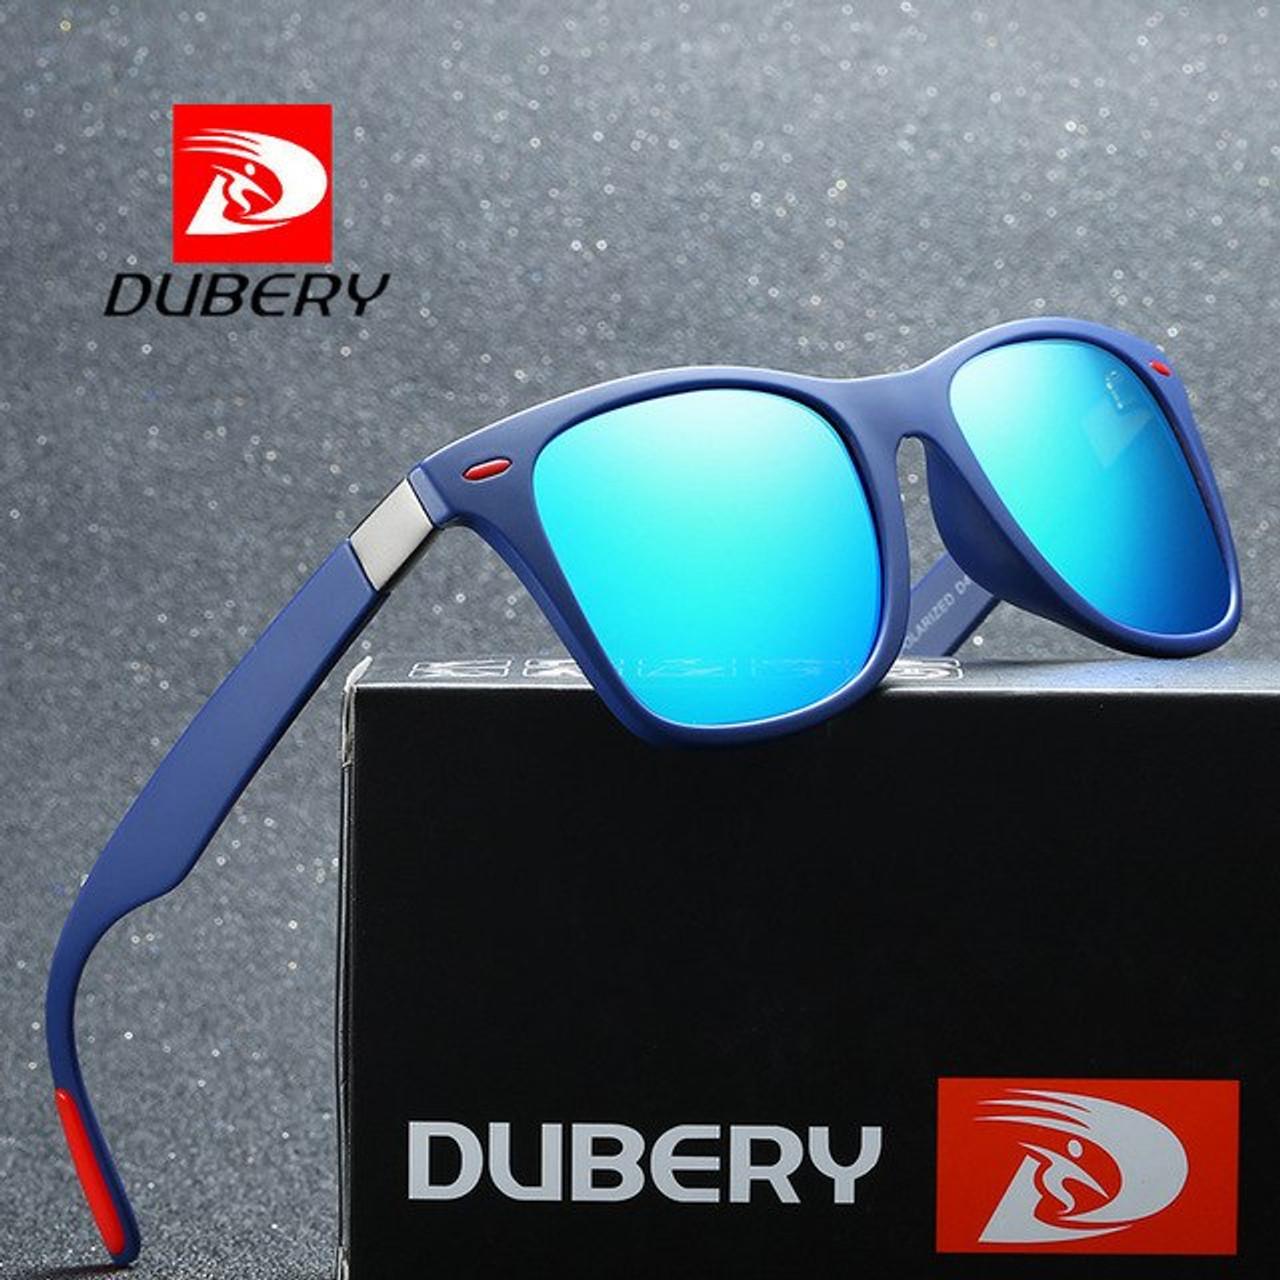 bb364ea2ec DUBERY Vintage Sunglasses Polarized Men s Sun Glasses For Men Square Shades  Driving Black Oculos Male 8 ...